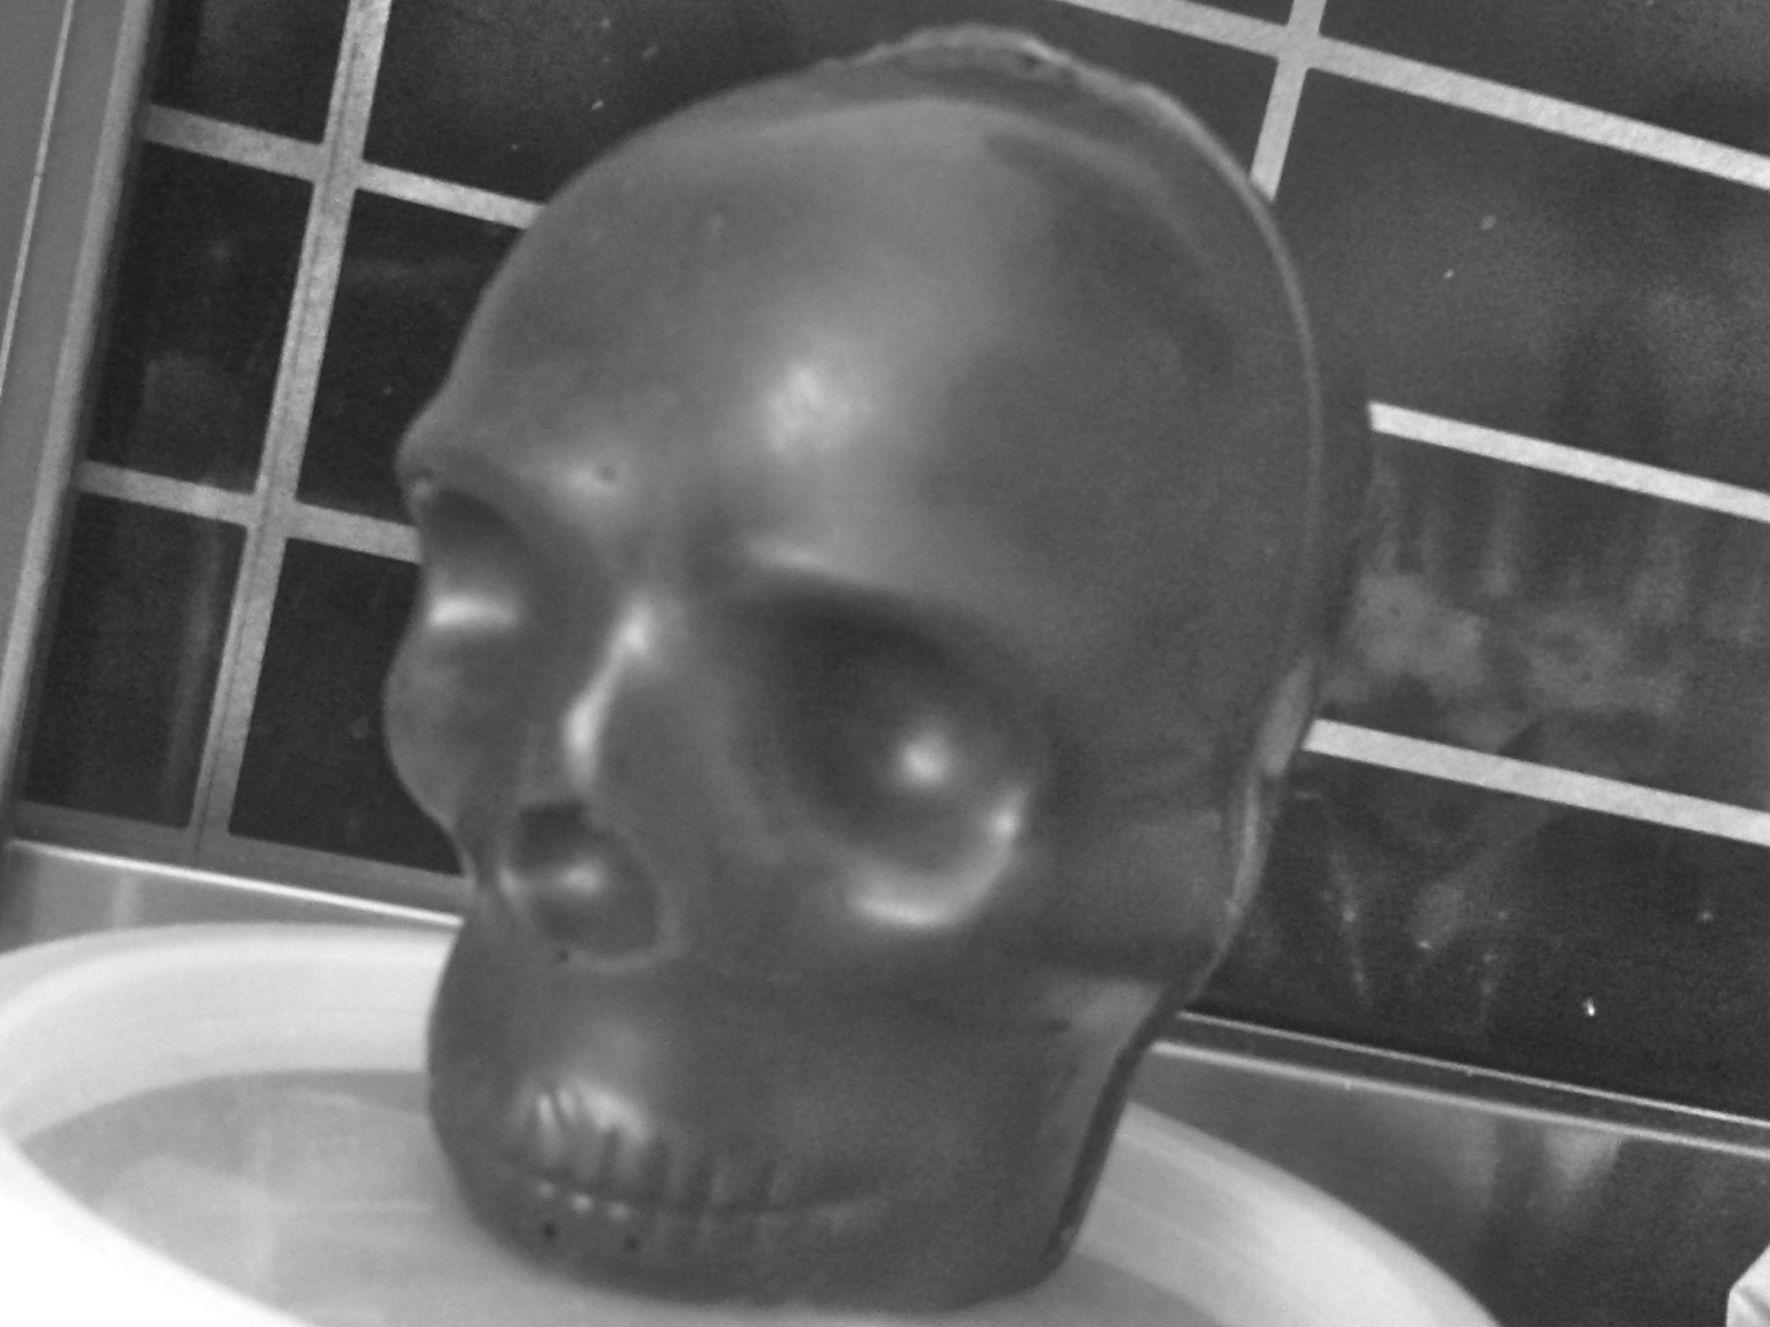 https://i2.wp.com/fatgayvegan.com/wp-content/uploads/2013/07/skull.jpg?fit=1770%2C1327